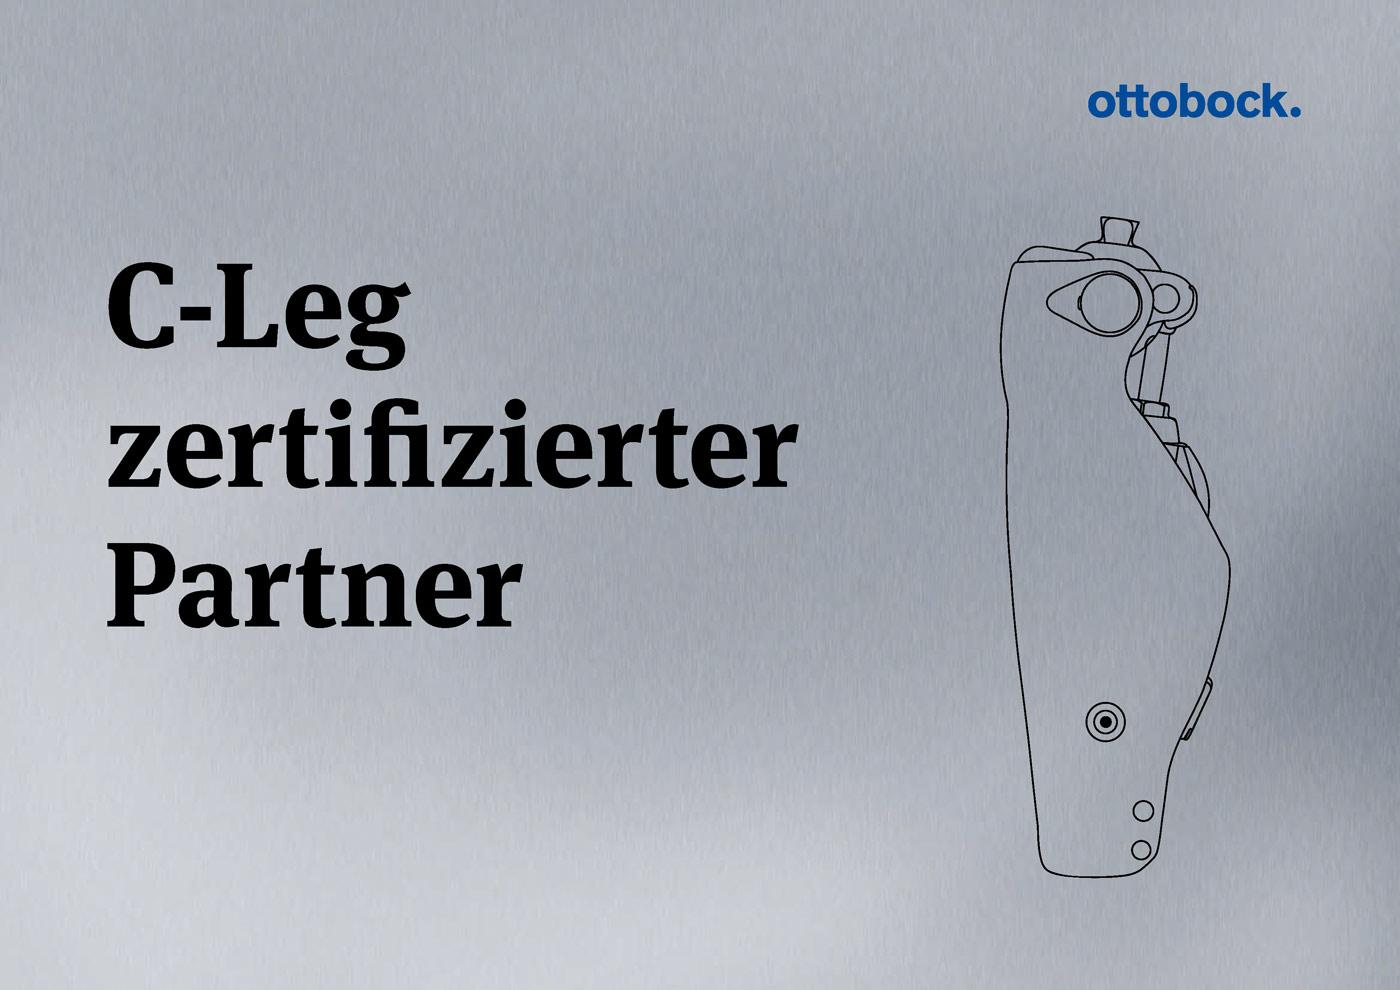 Zertifikat Ottobock C-Leg